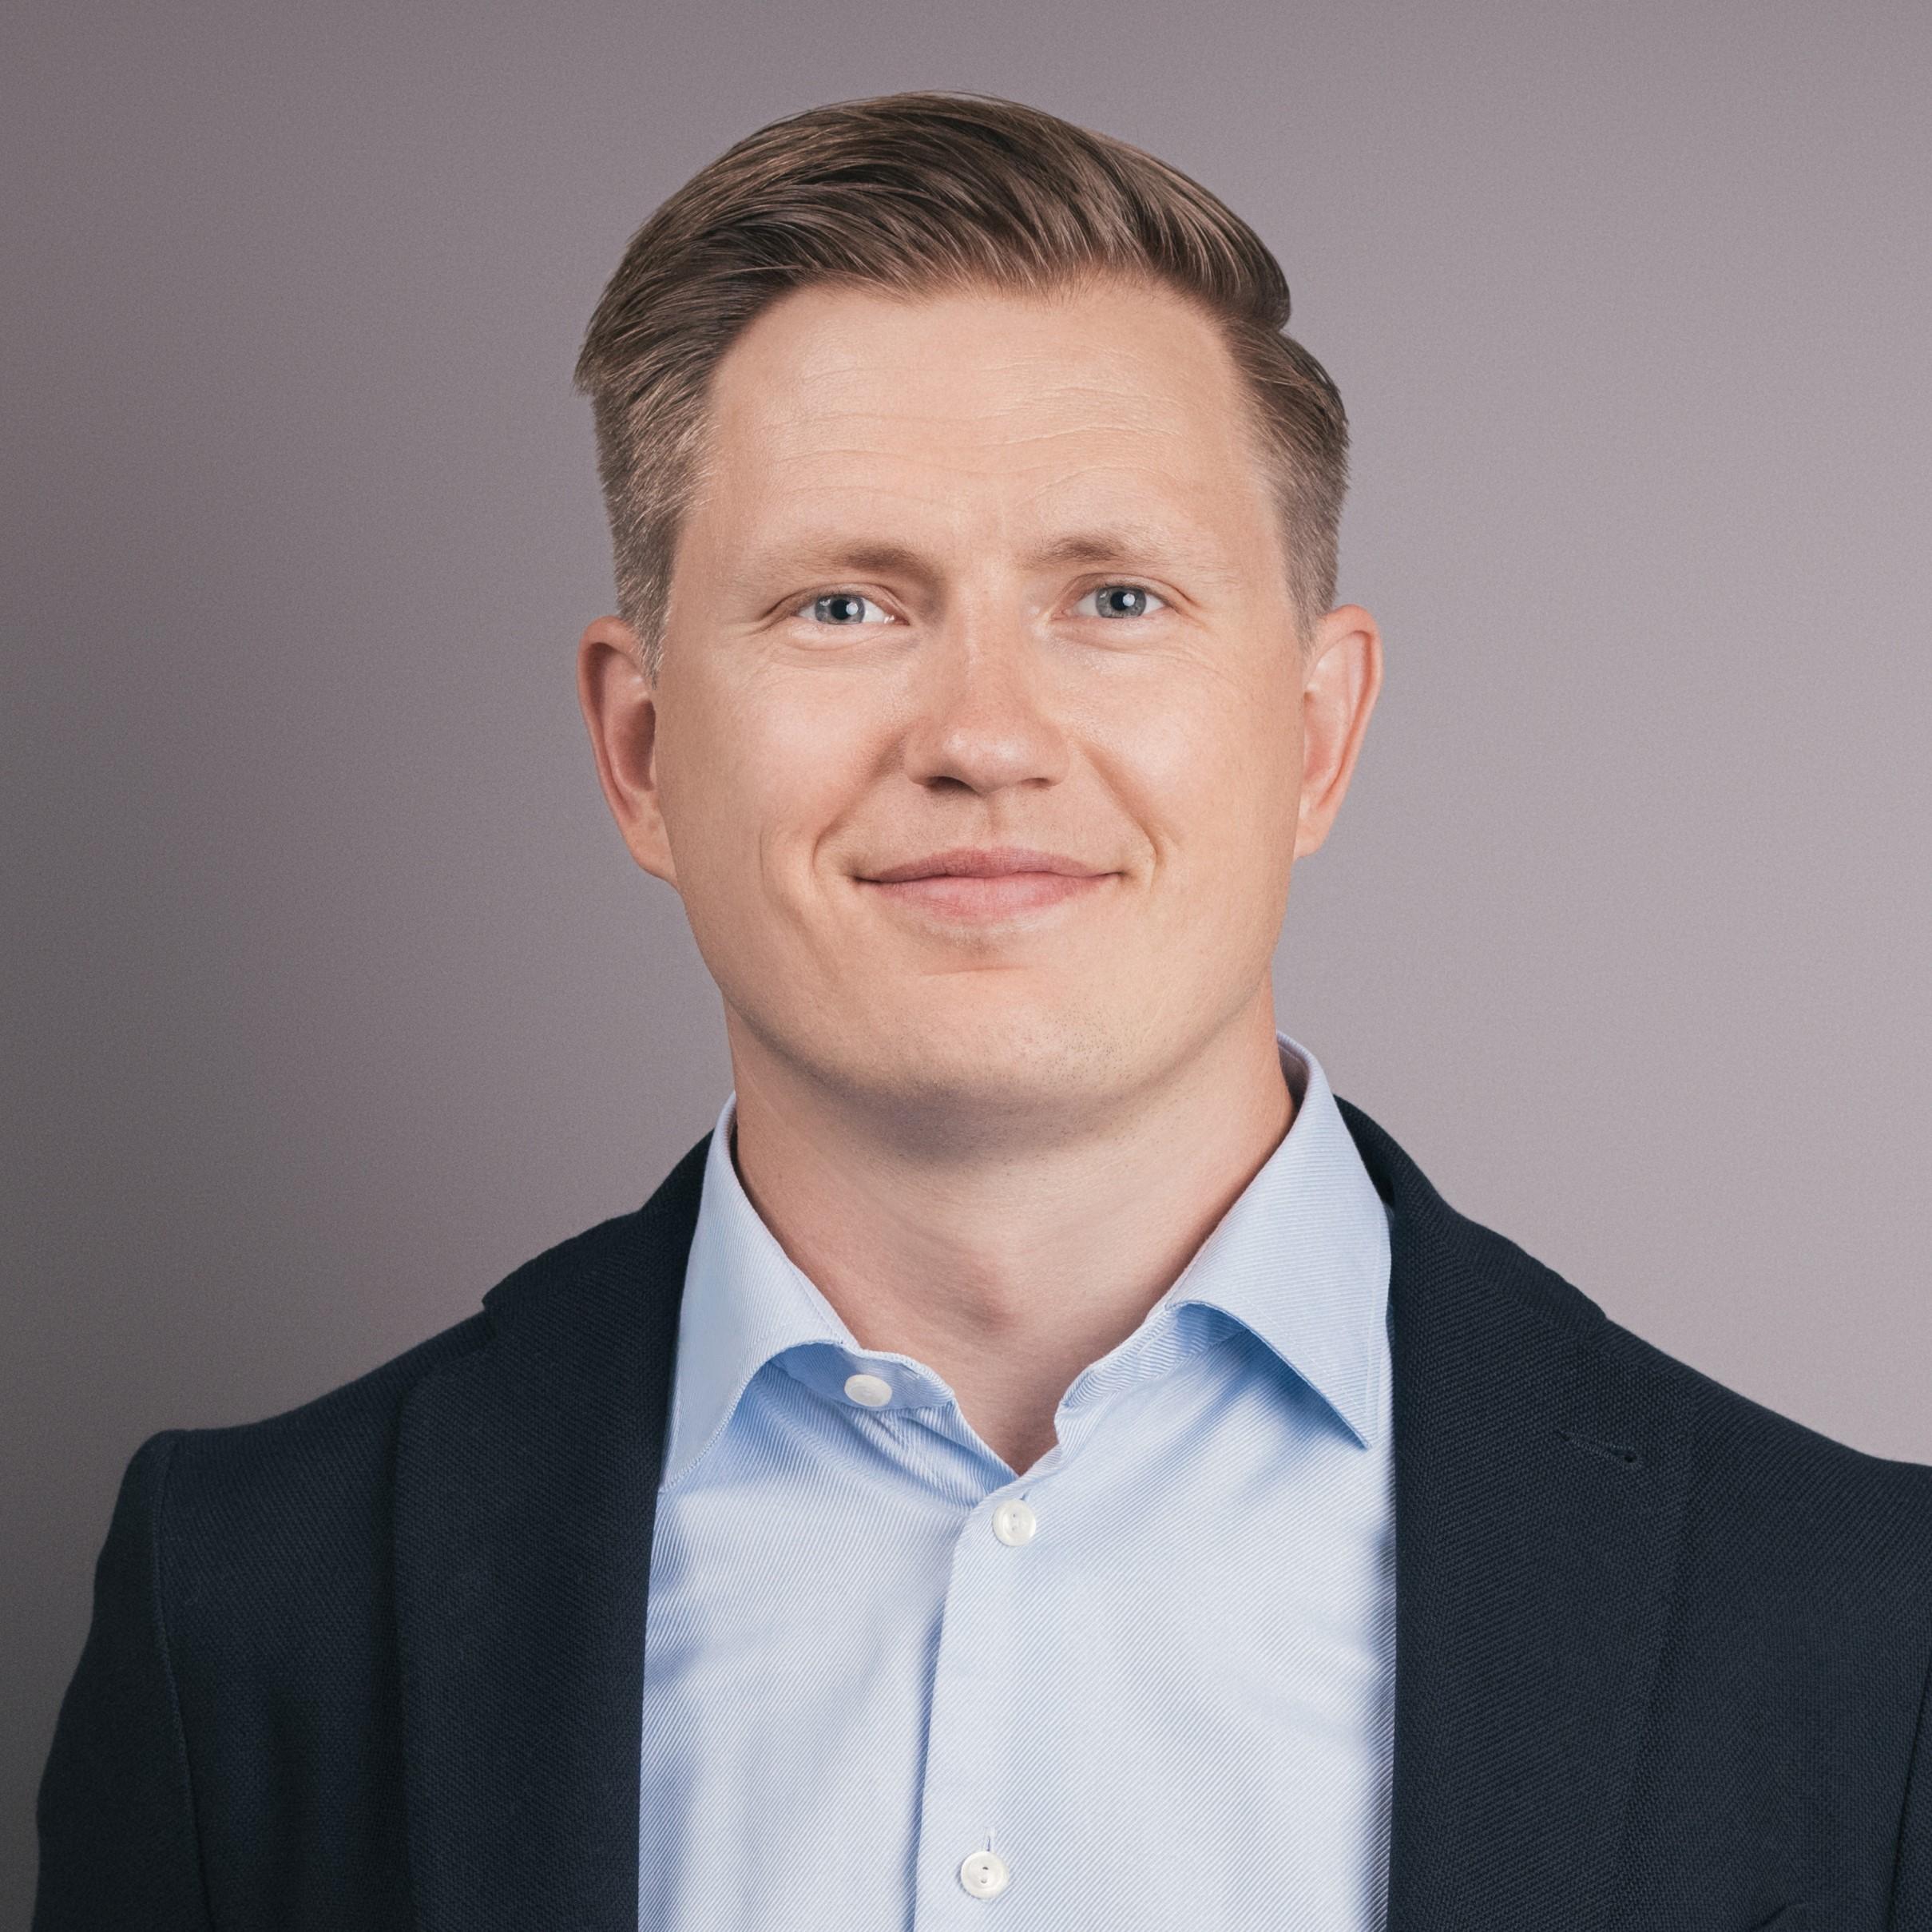 Photo of Daniel Ahlstrand